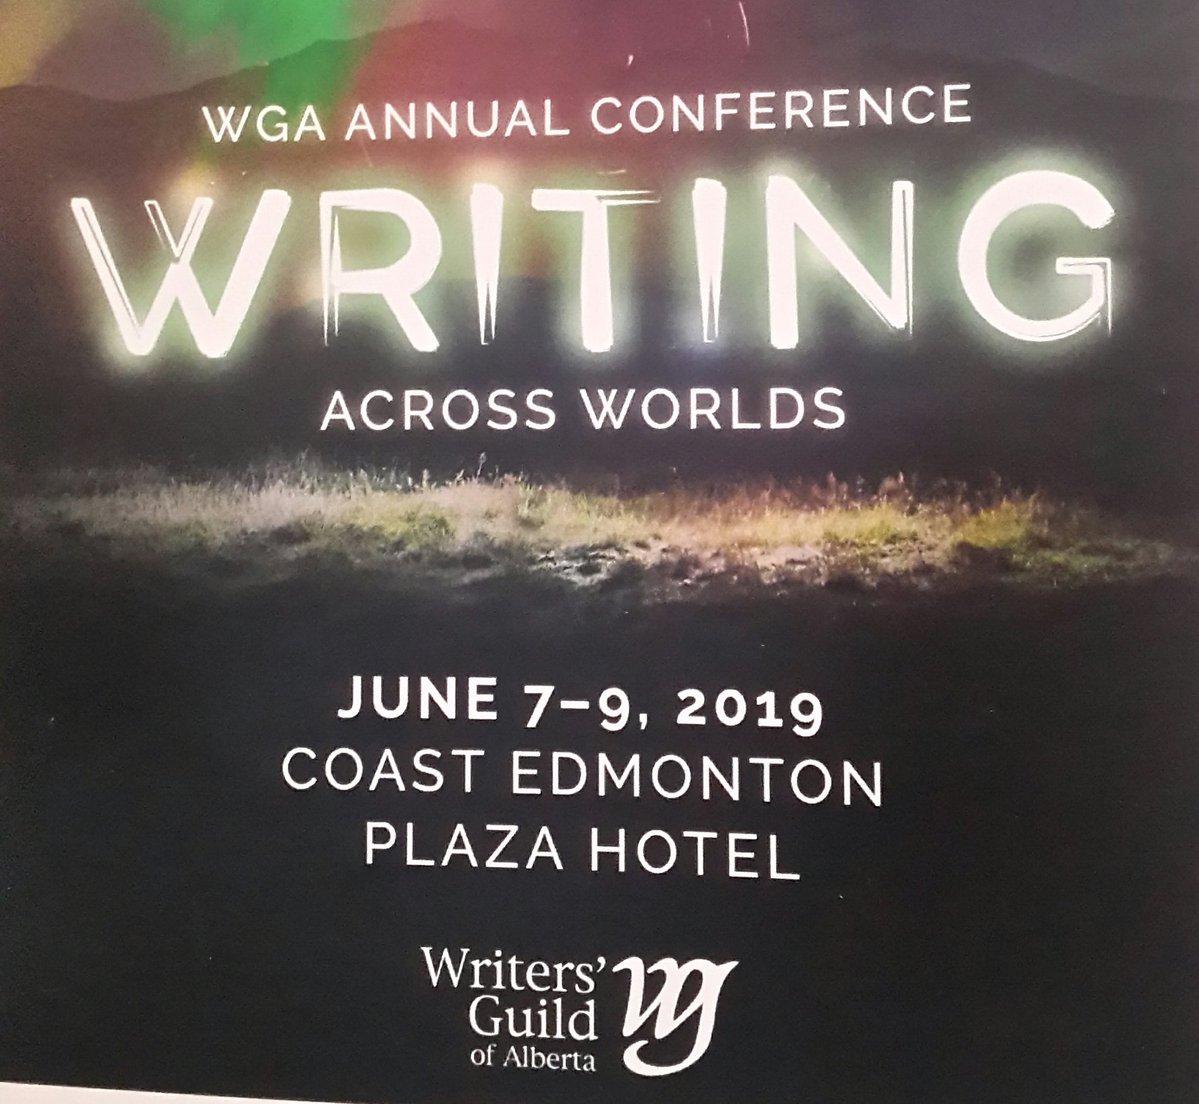 WGAConference.jpg